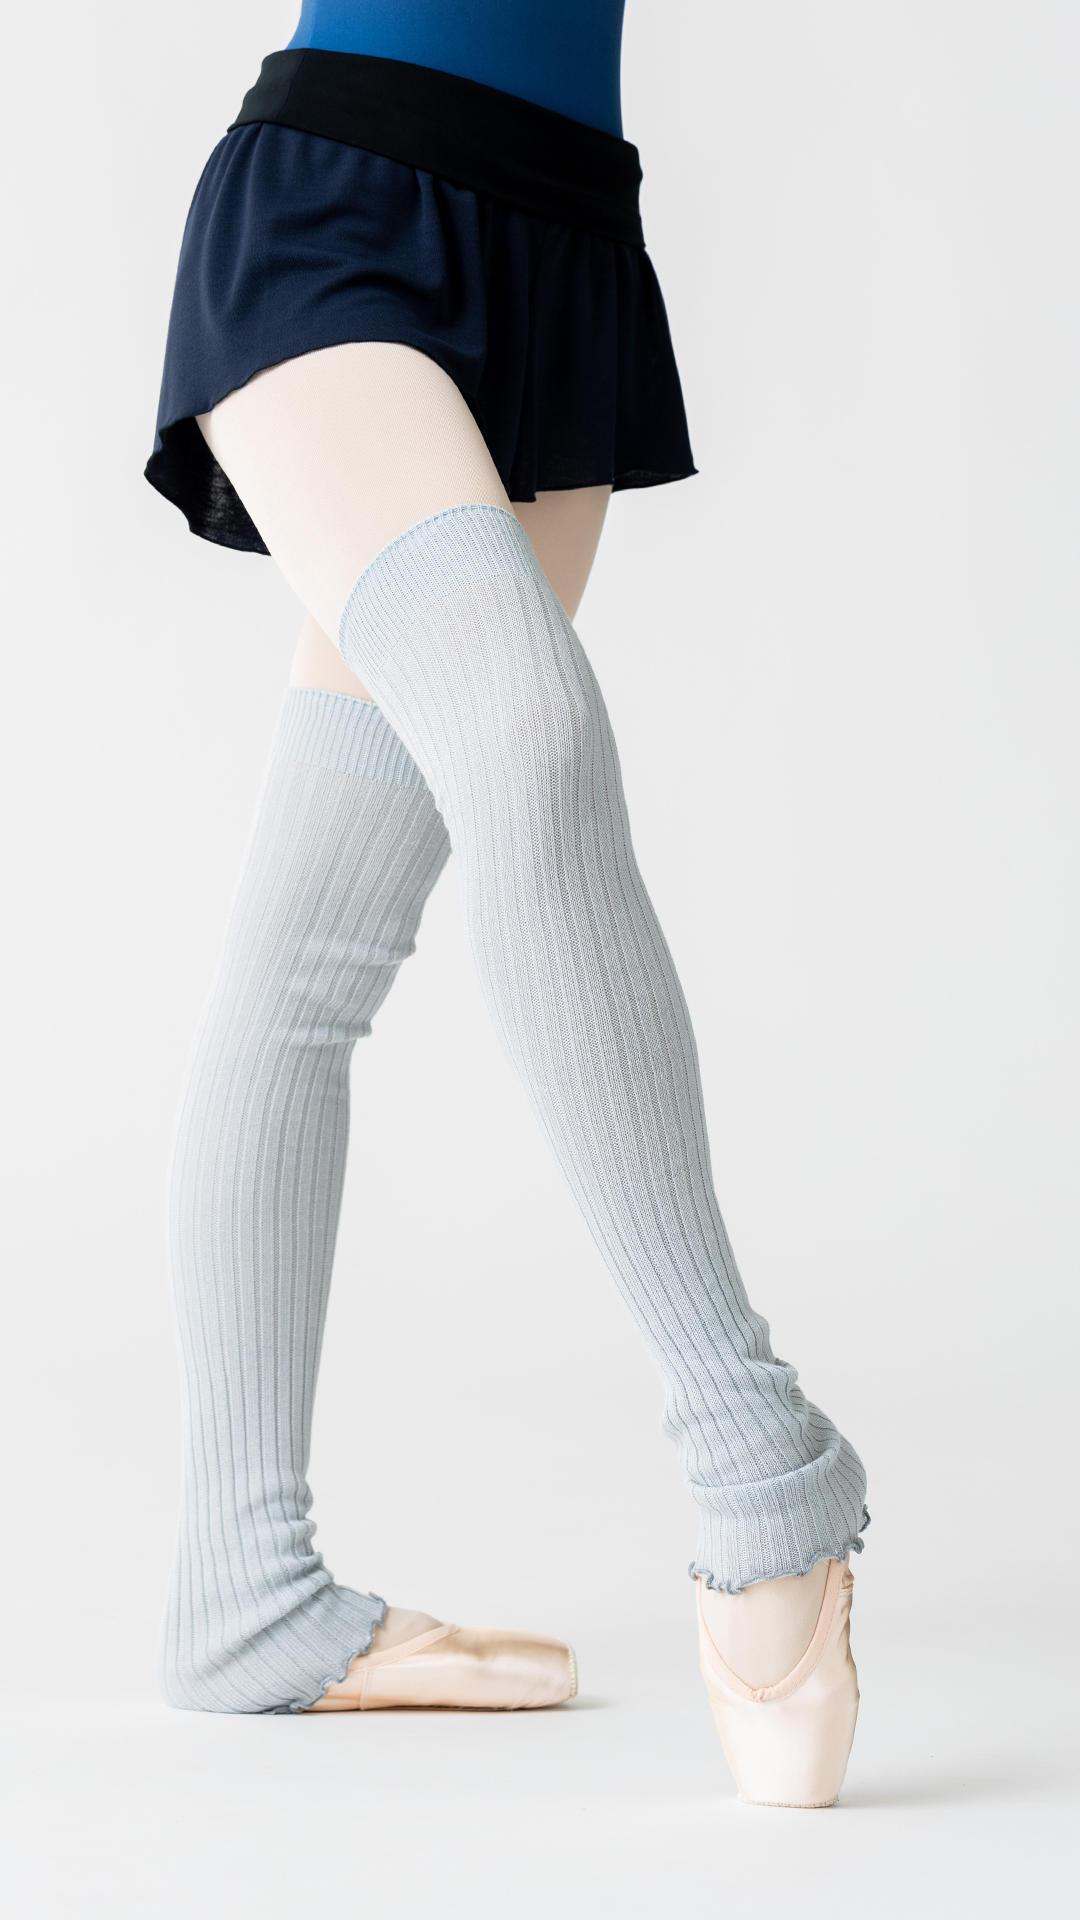 1022_leg_collection_6.jpg